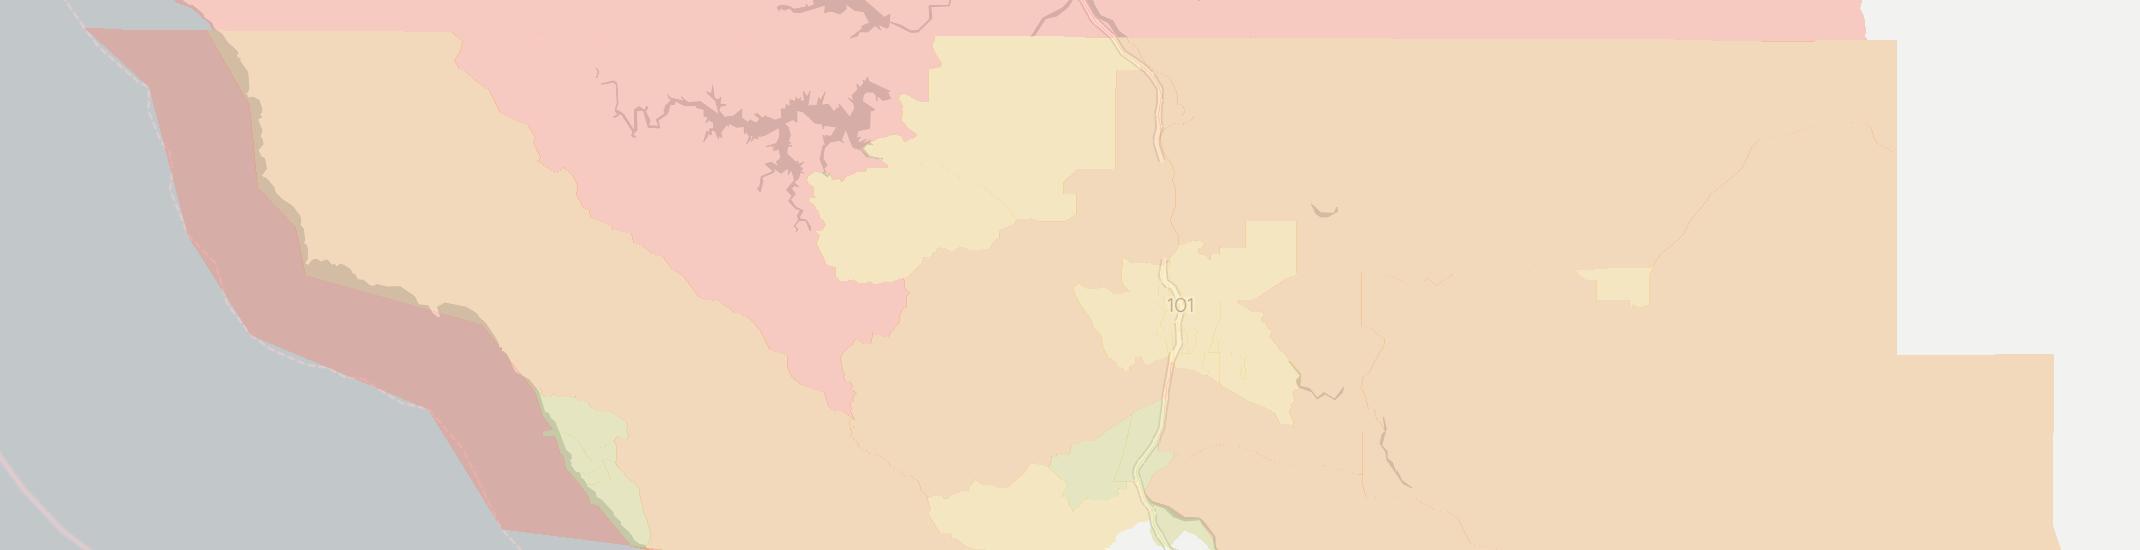 9 Best Internet Service Providers in Paso Robles, CA